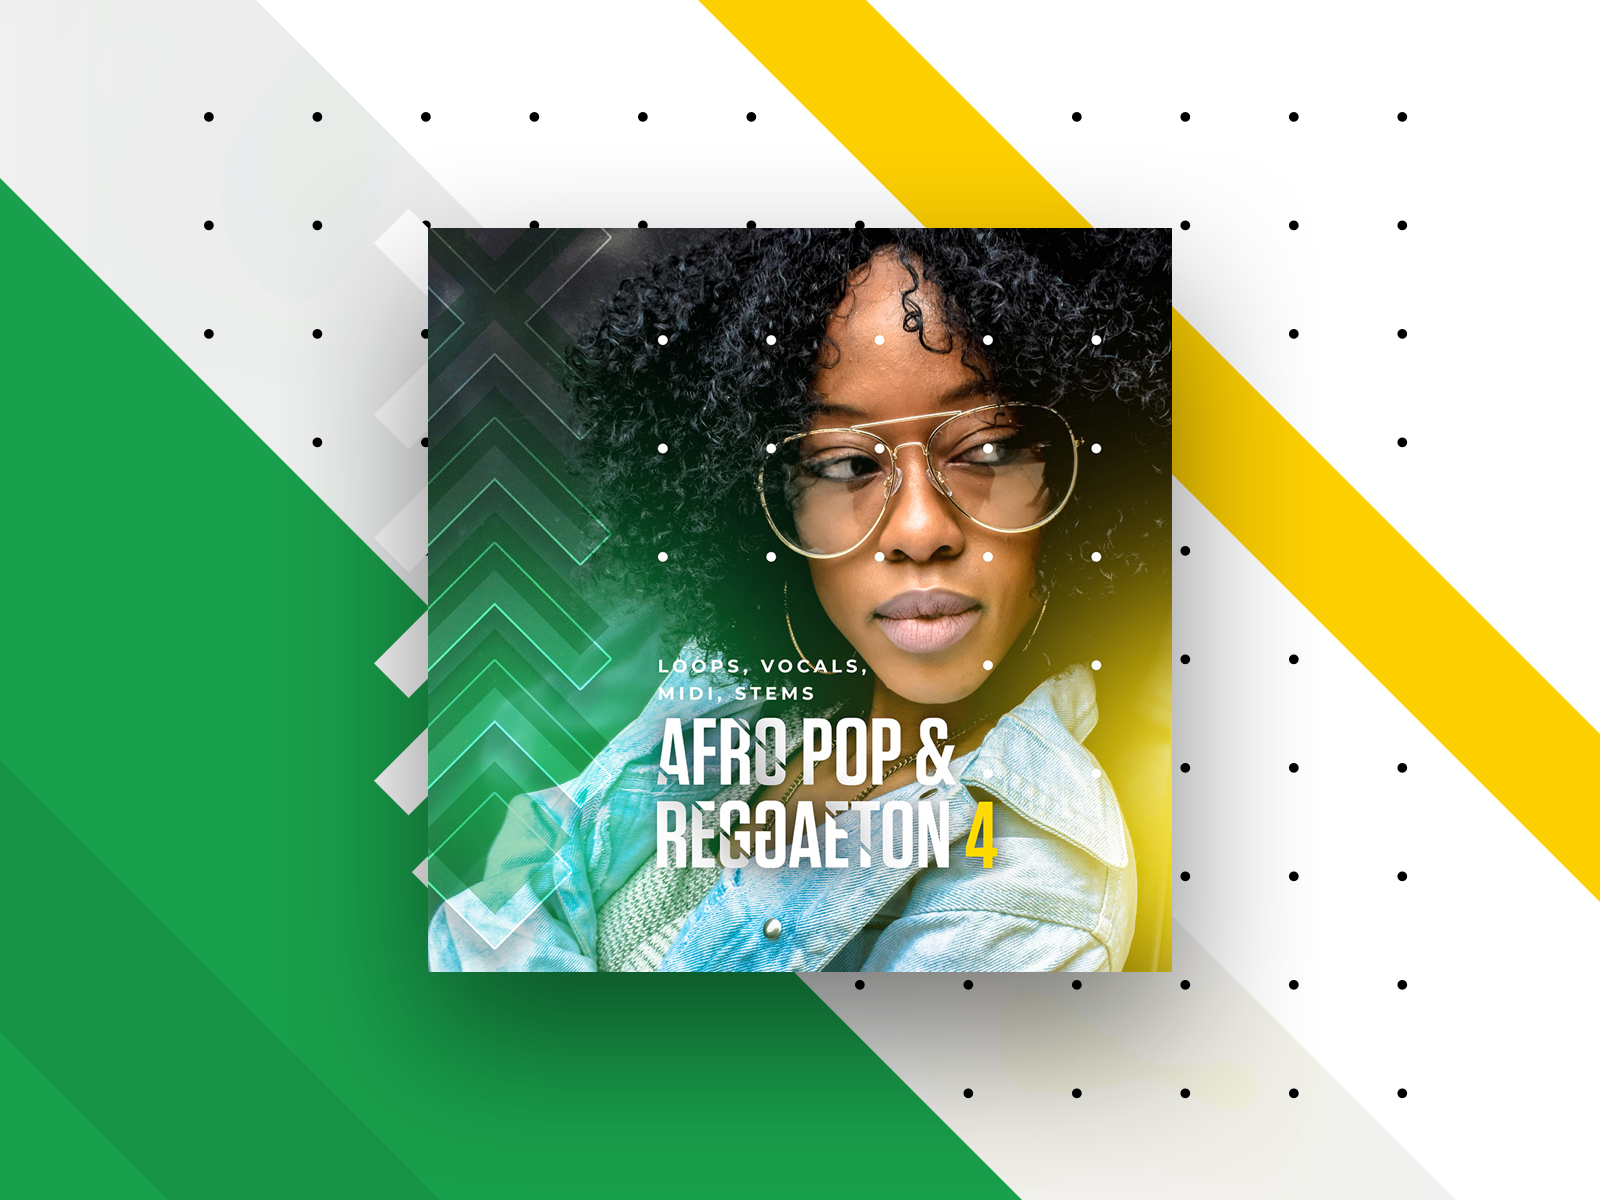 Afro Pop Reggaeton 4 By Damian Dmowski On Dribbble